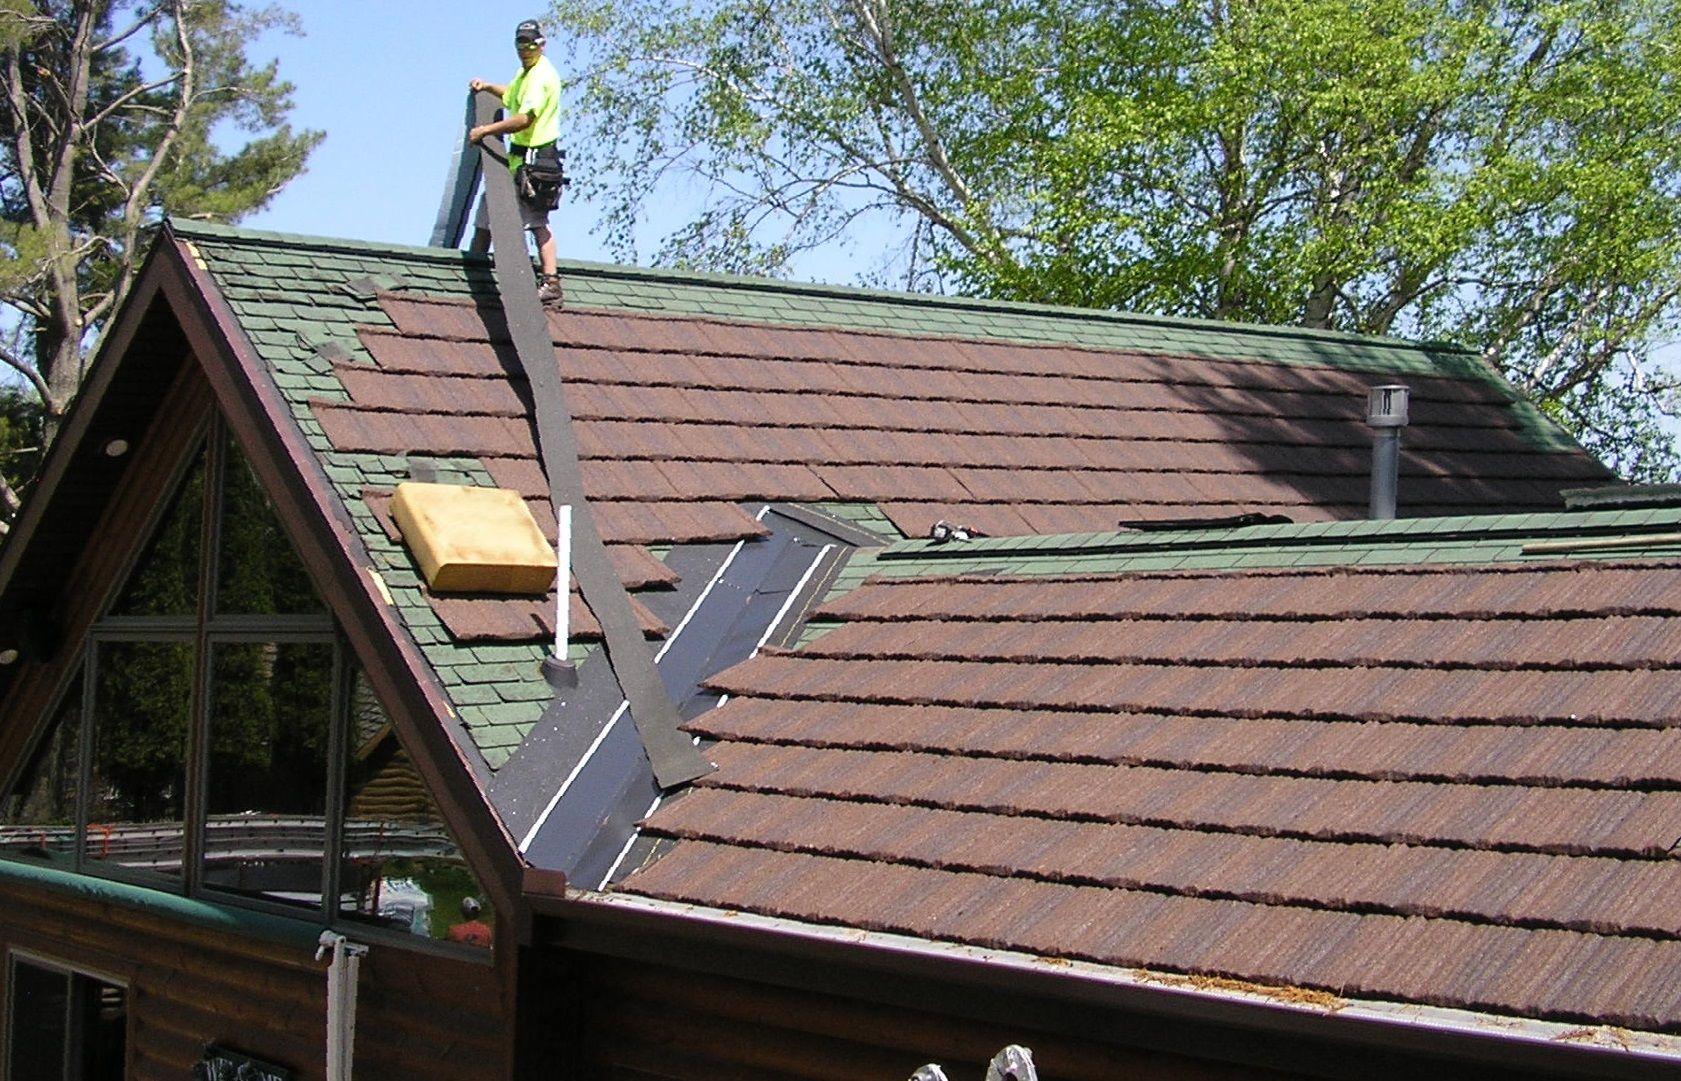 Waji Gerad Stone Coated Roofing Sheets New Zealand Bond Roofing Roofing Companies Roofing Sheets